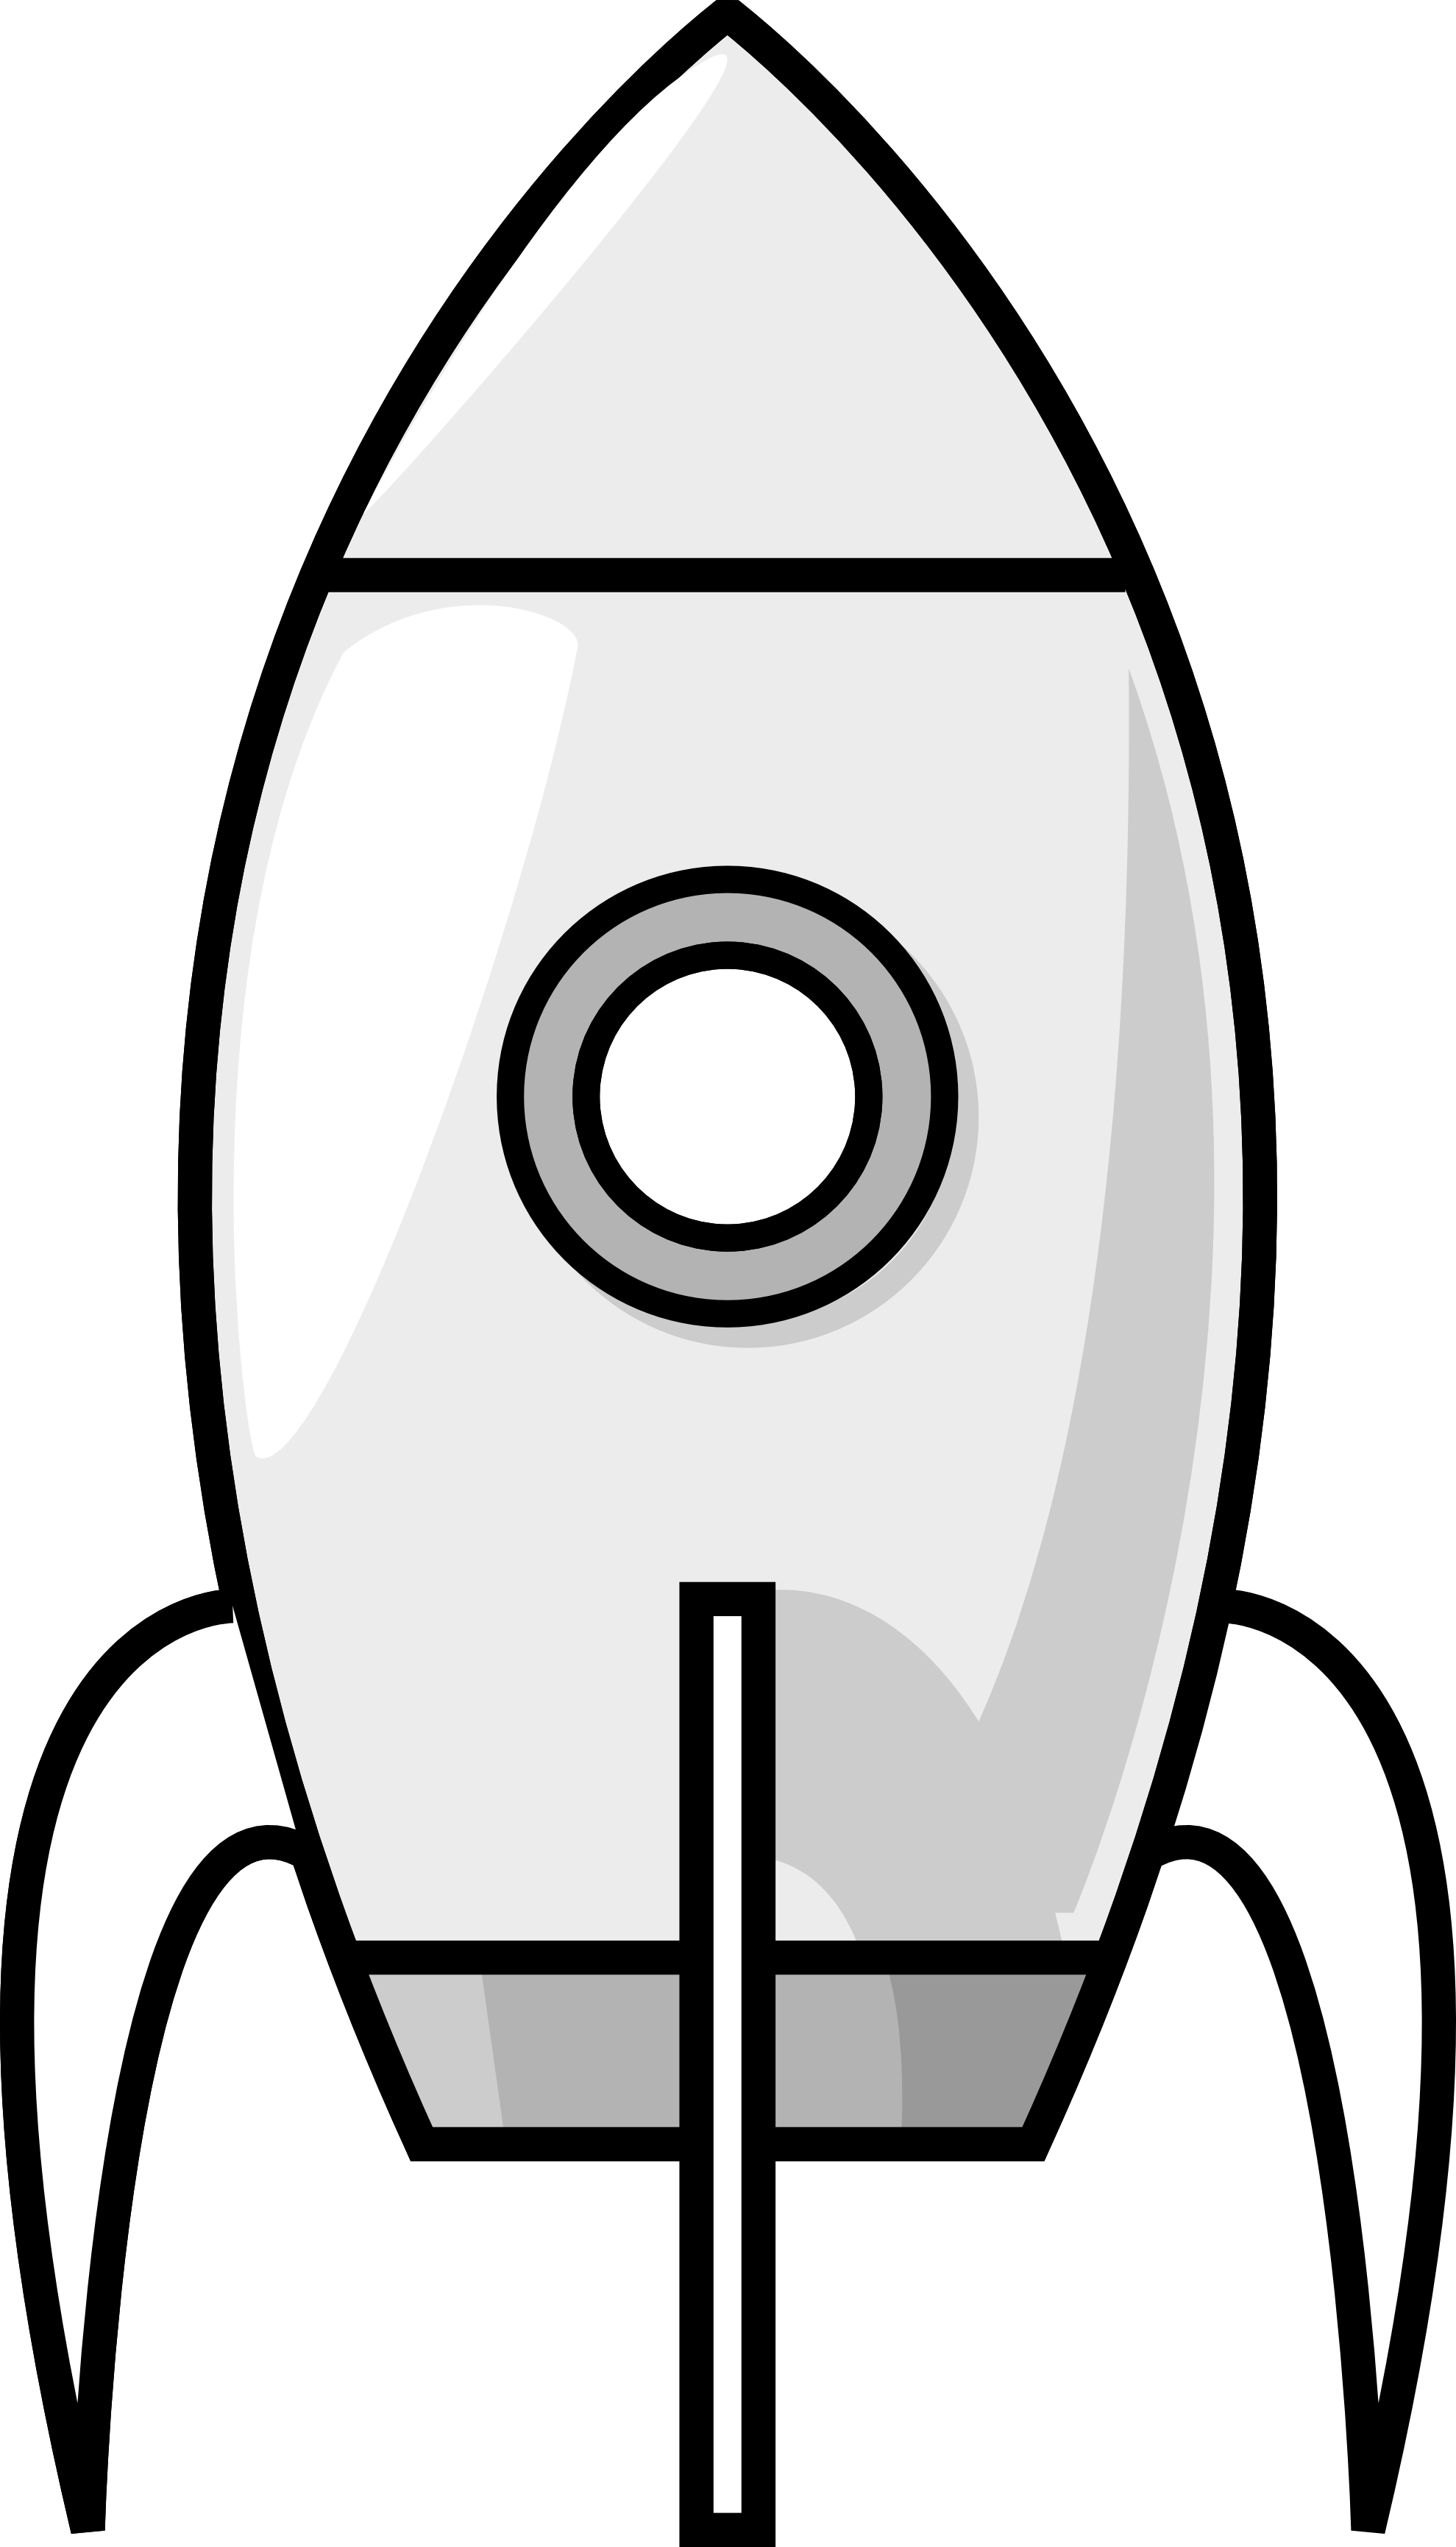 Clipart rocket spaceship. Space ship clip art